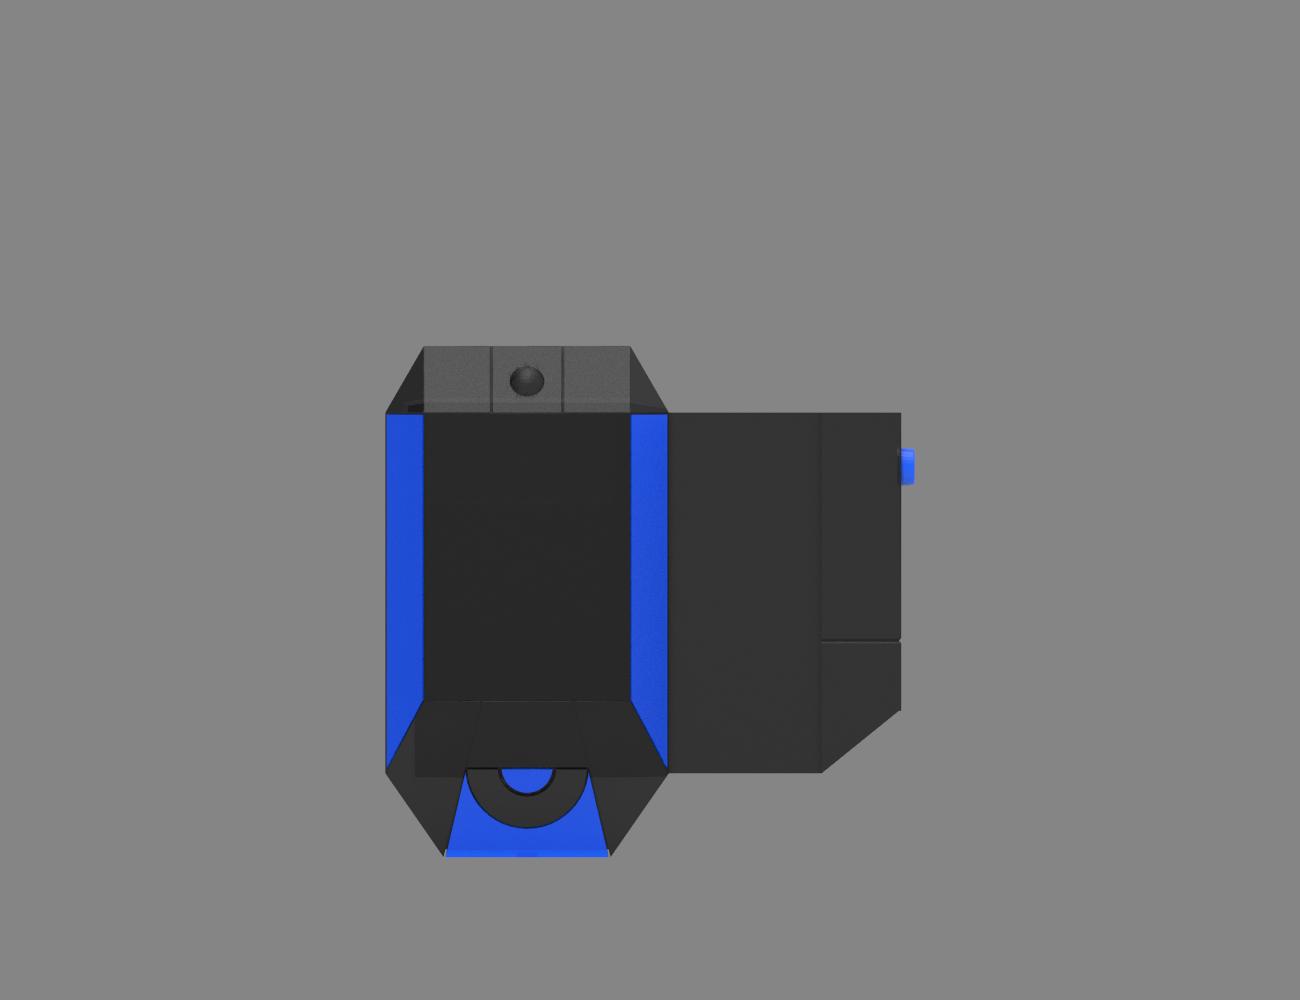 render_scene.10.png Download STL file Pokemon Xtransceiver 3D print model • 3D print model, 3D-mon